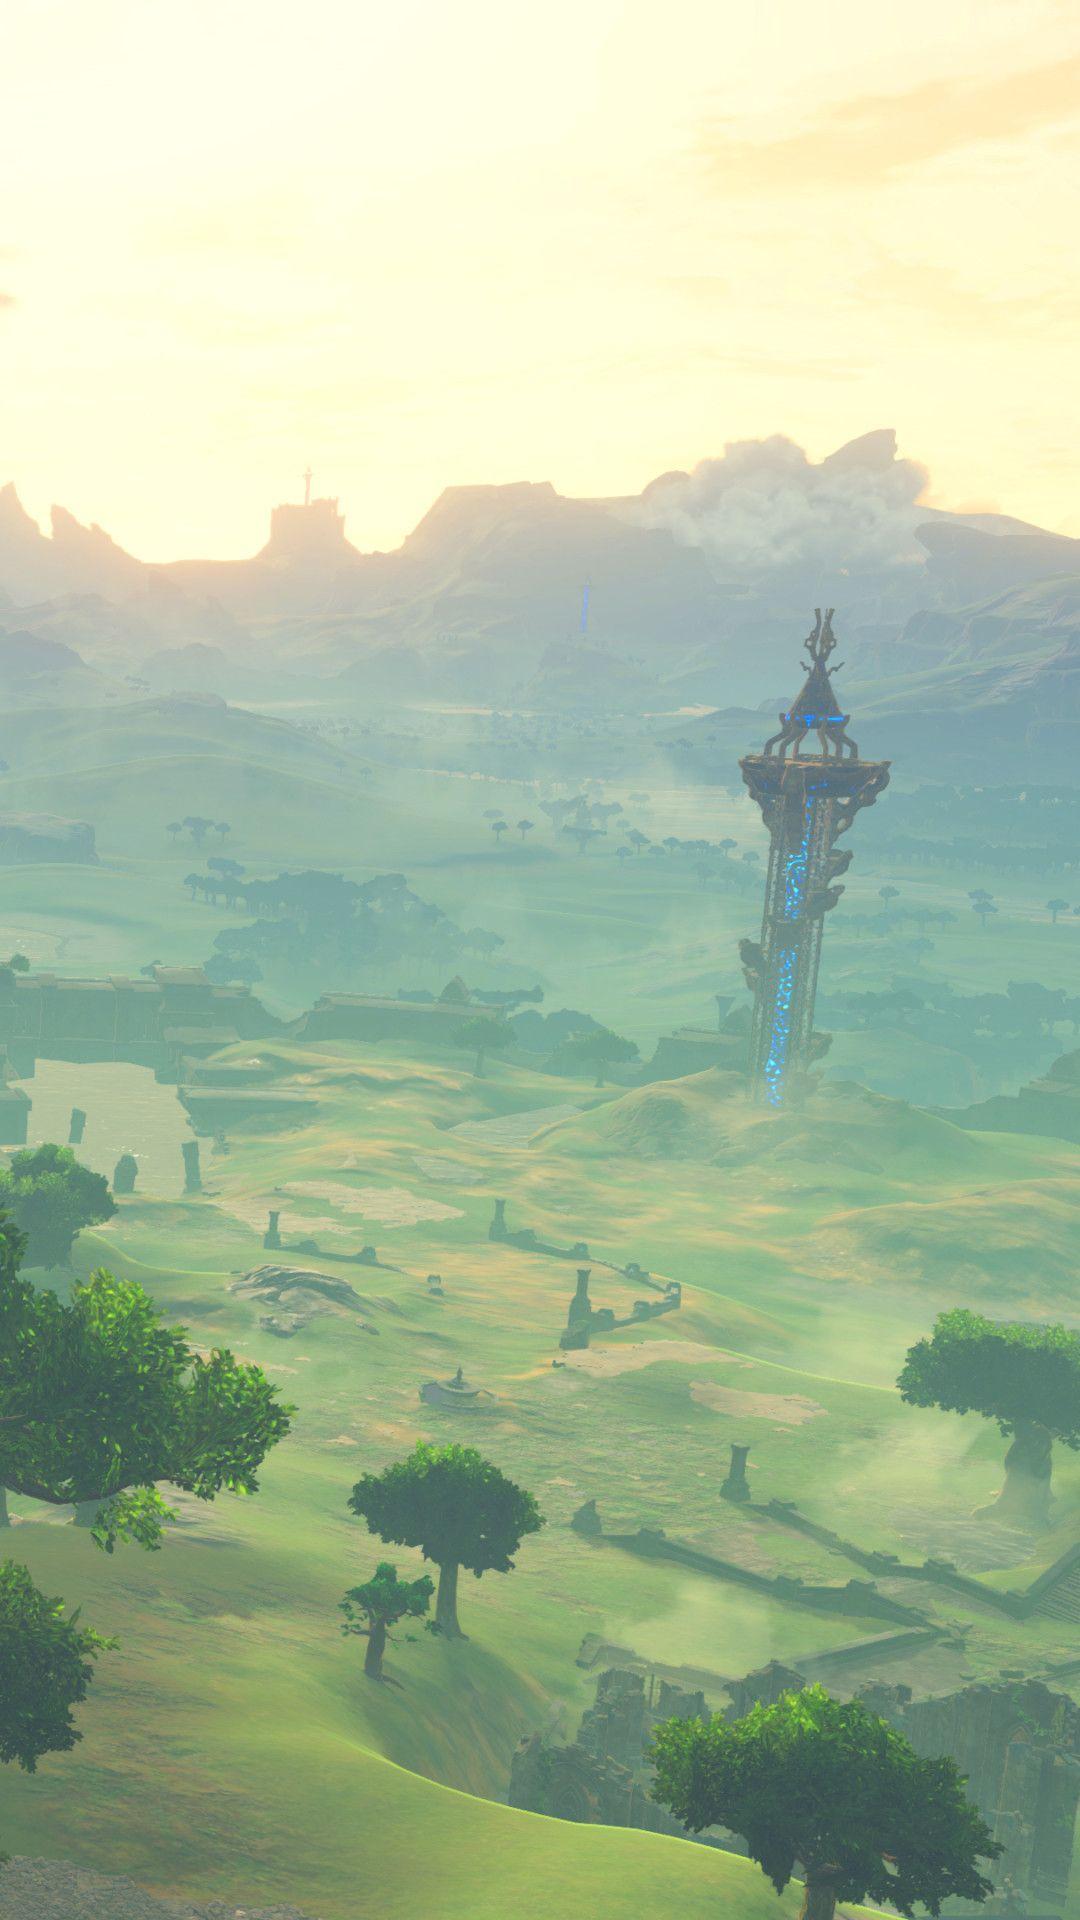 1080x1920 Download Iphone Legend Of Zelda Breath Legend Of Zelda Fantasy Landscape